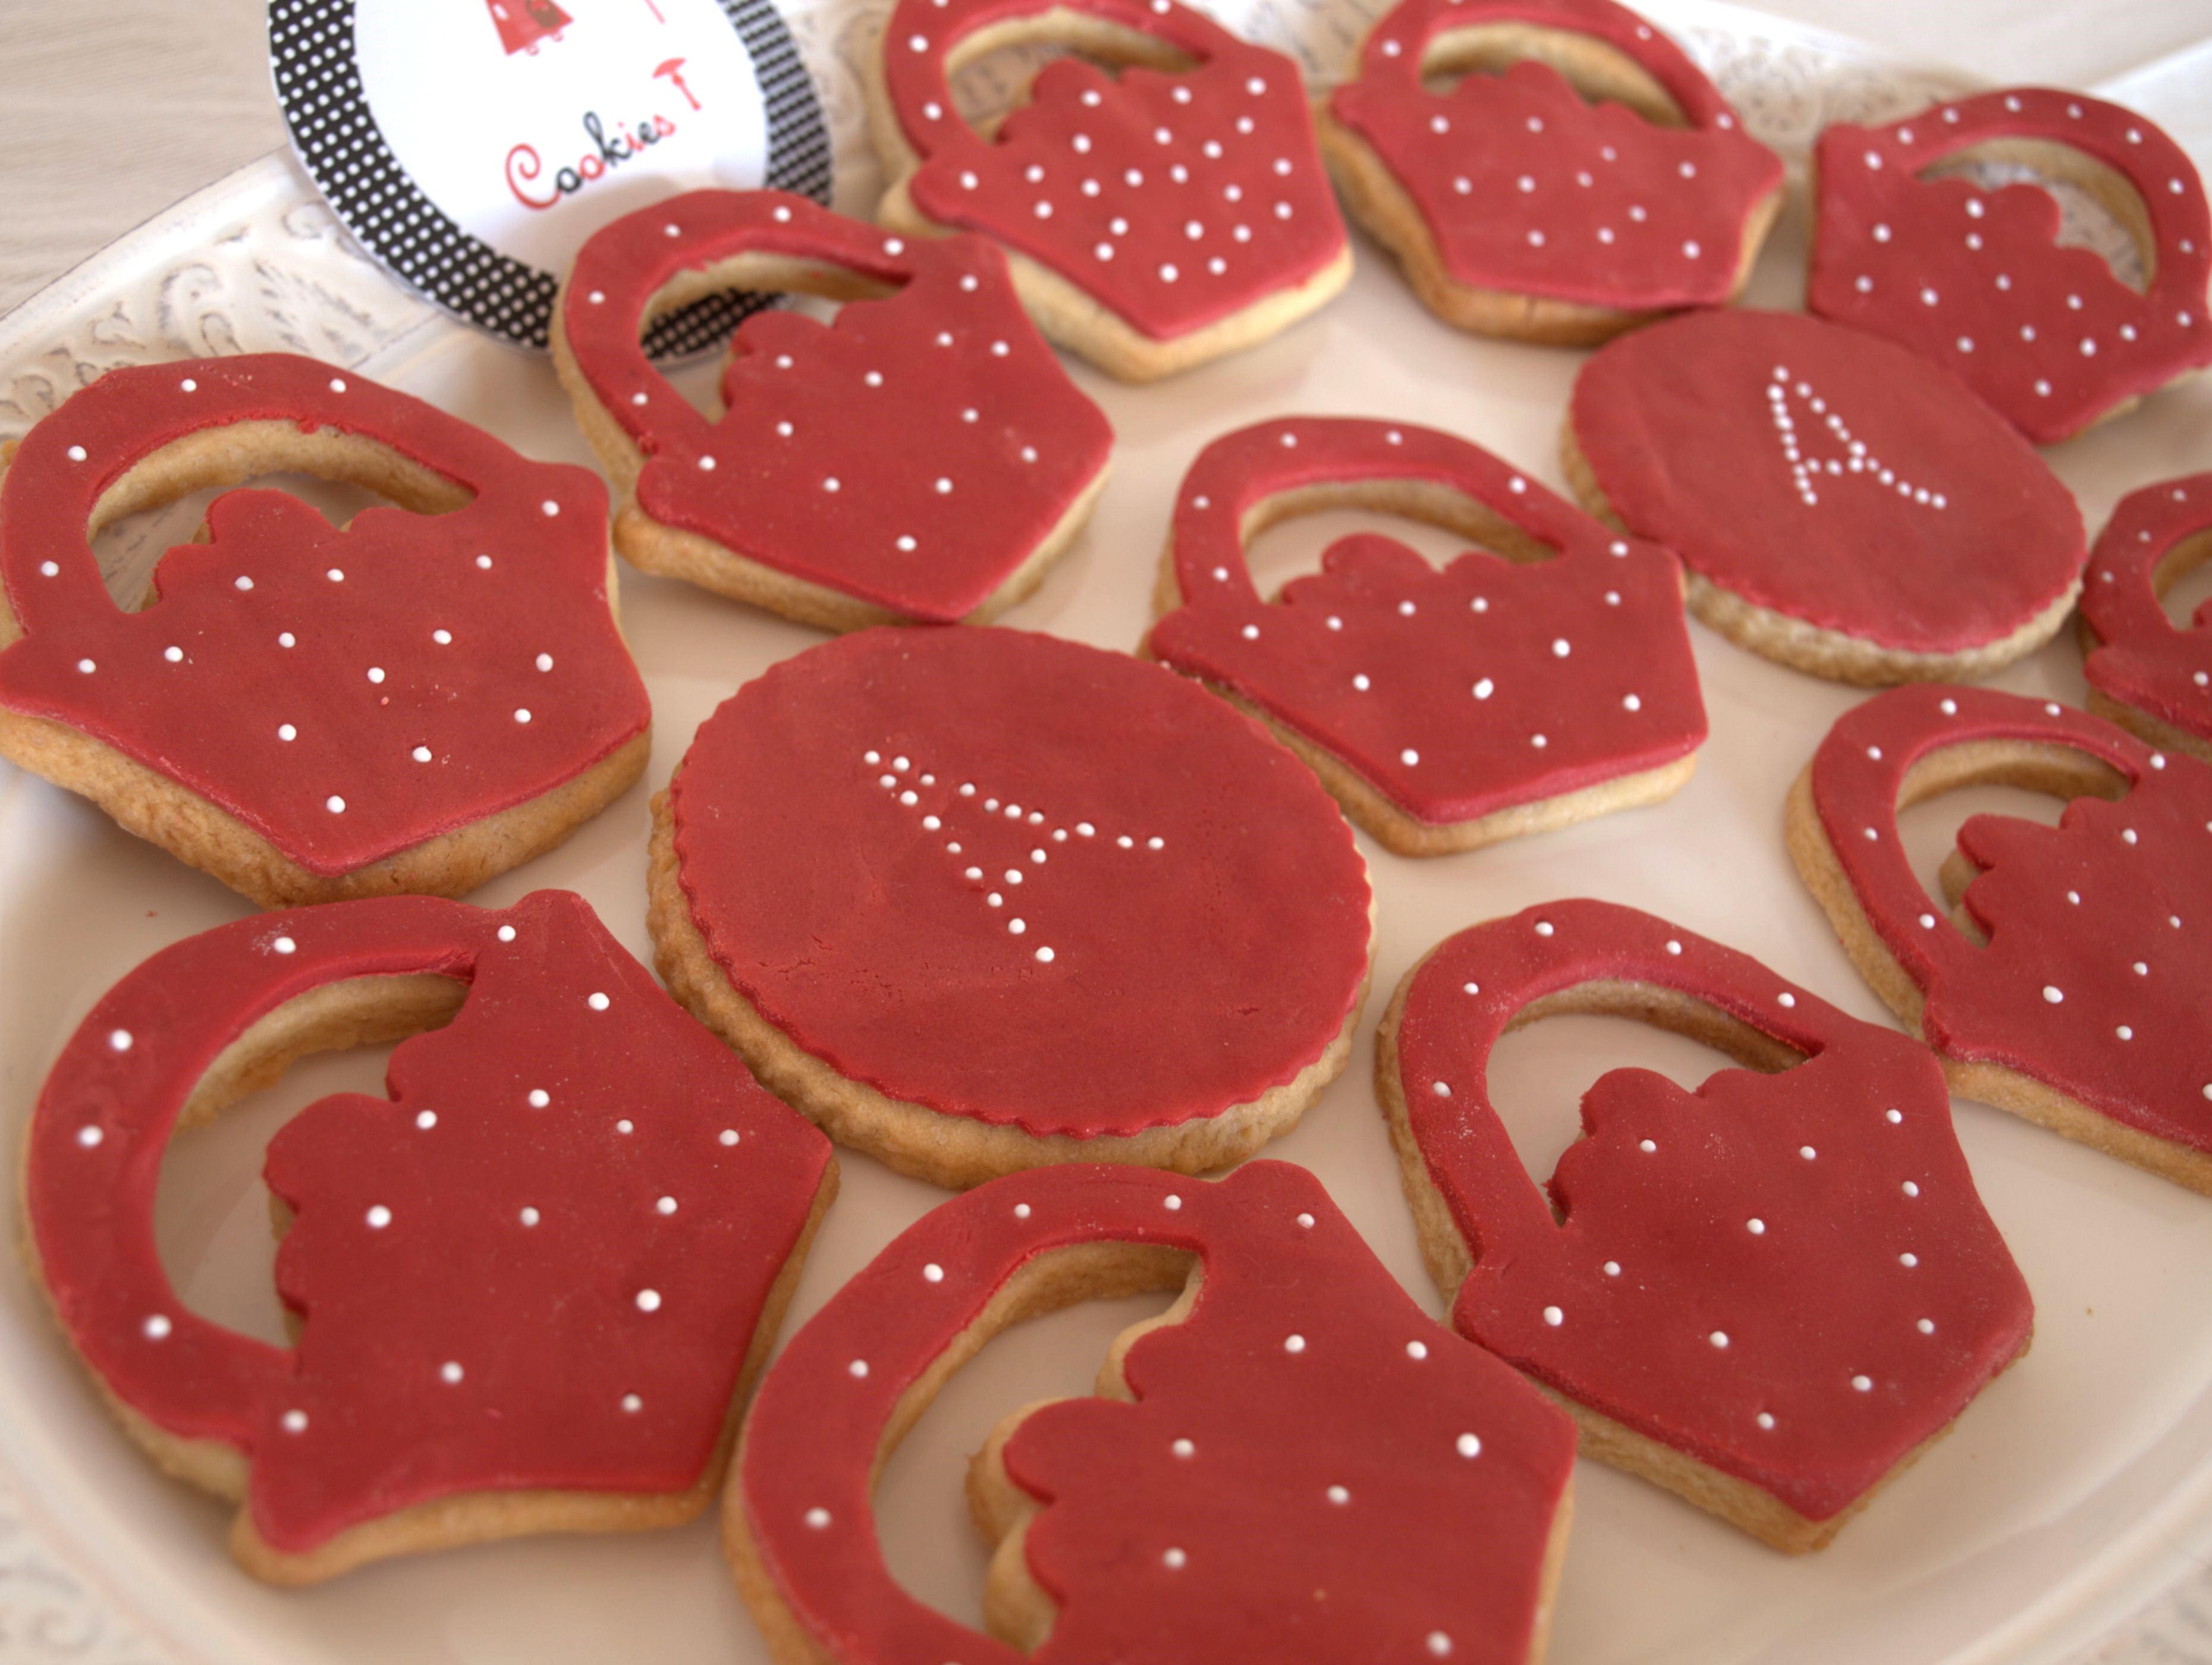 biscuits-decores-anniversaire-panier-chaperon-rouge-enfant-mumtobeparty